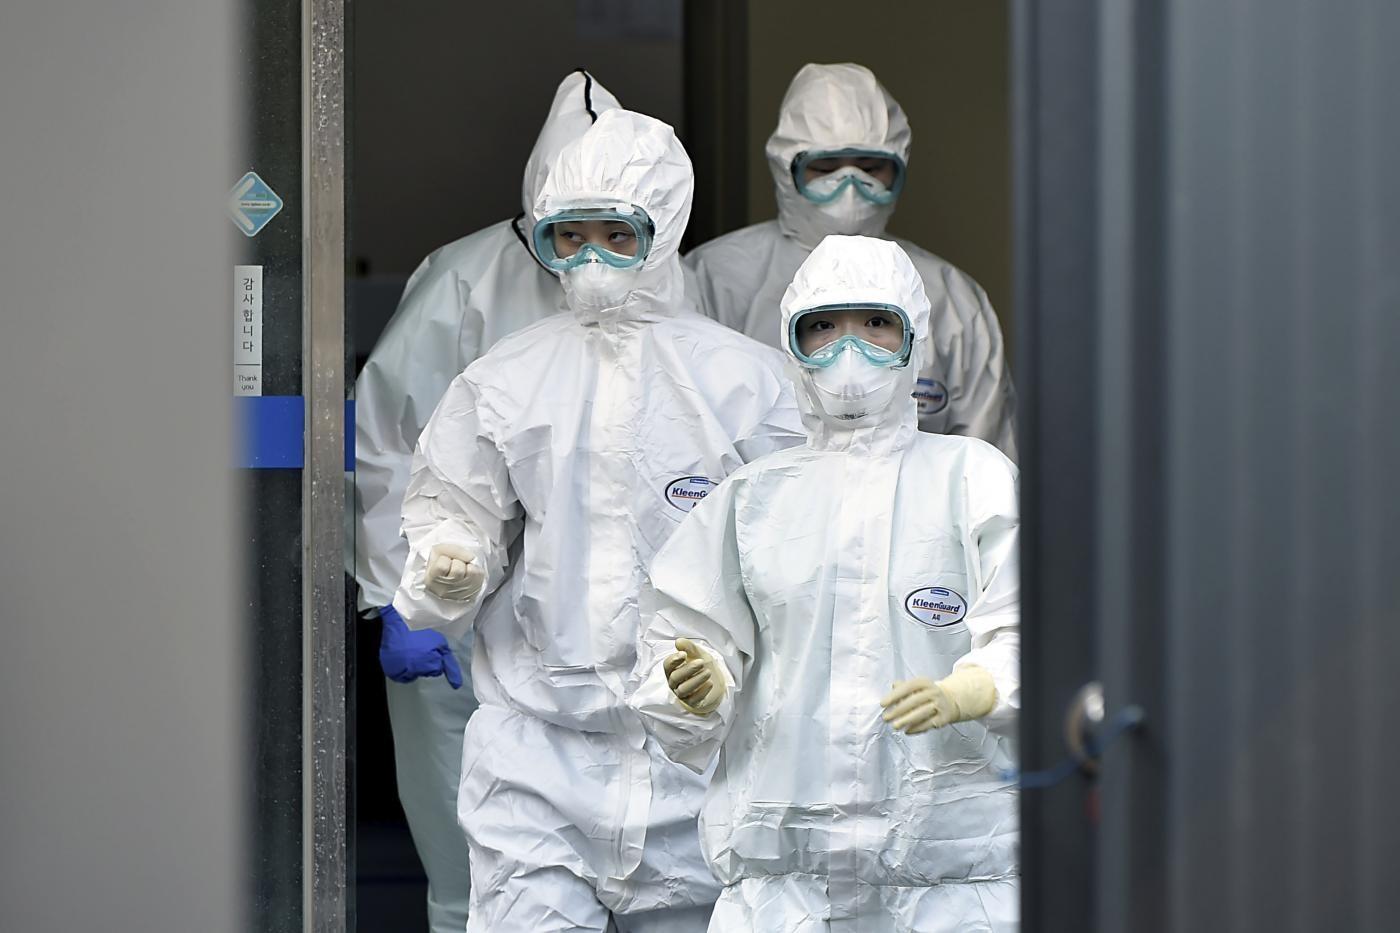 Coronavirus, 152 nuovi casi in Sud Corea: focolai a Daegu e Seul